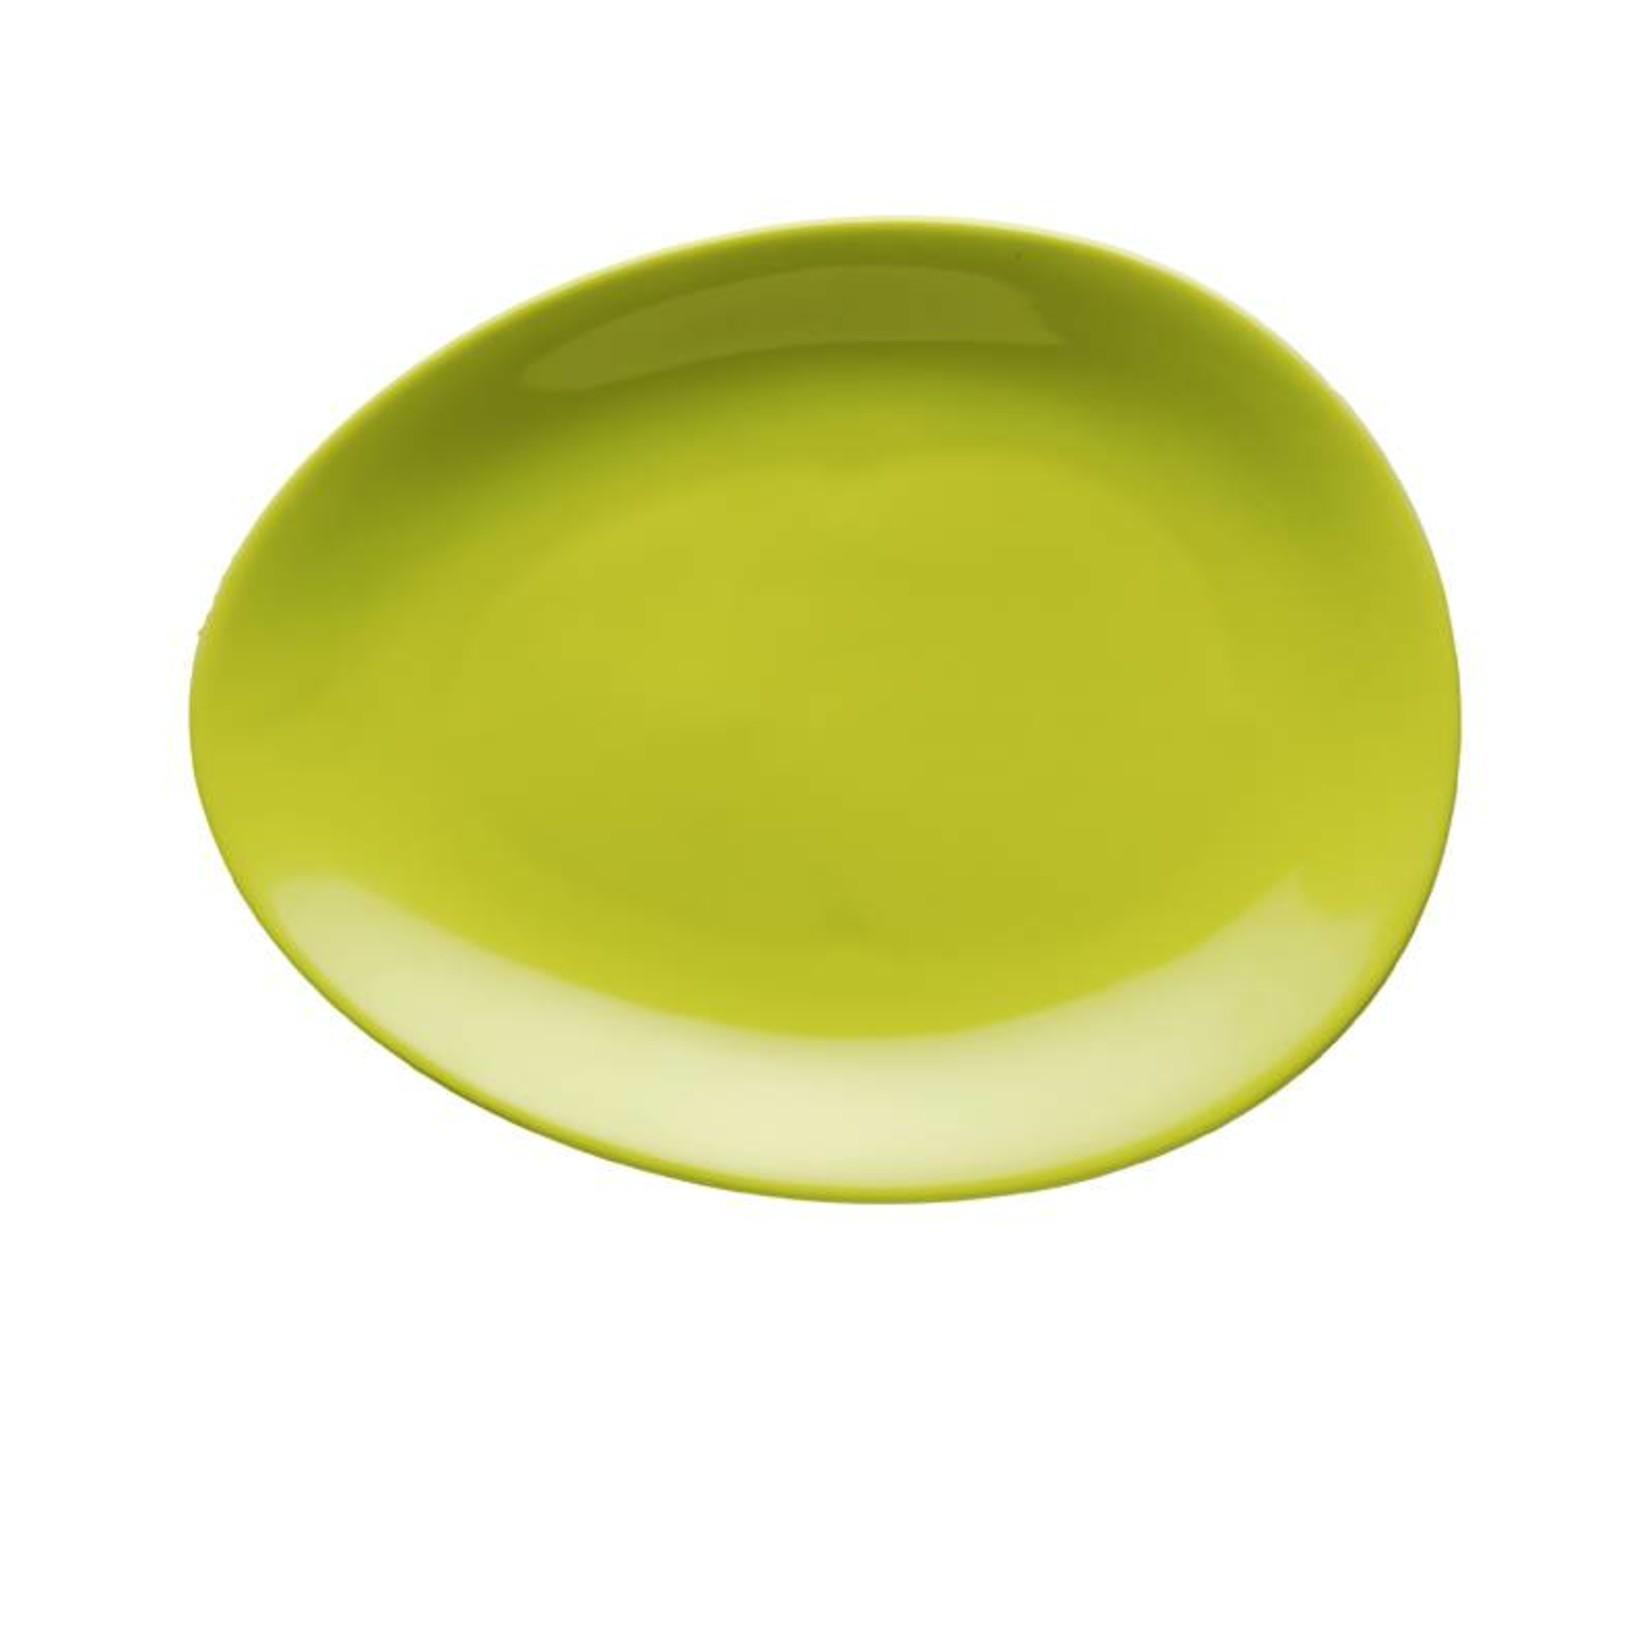 Colani Porzellanserie Colani Dessertteller | grün | Frühstücksteller Luigi Colani Design